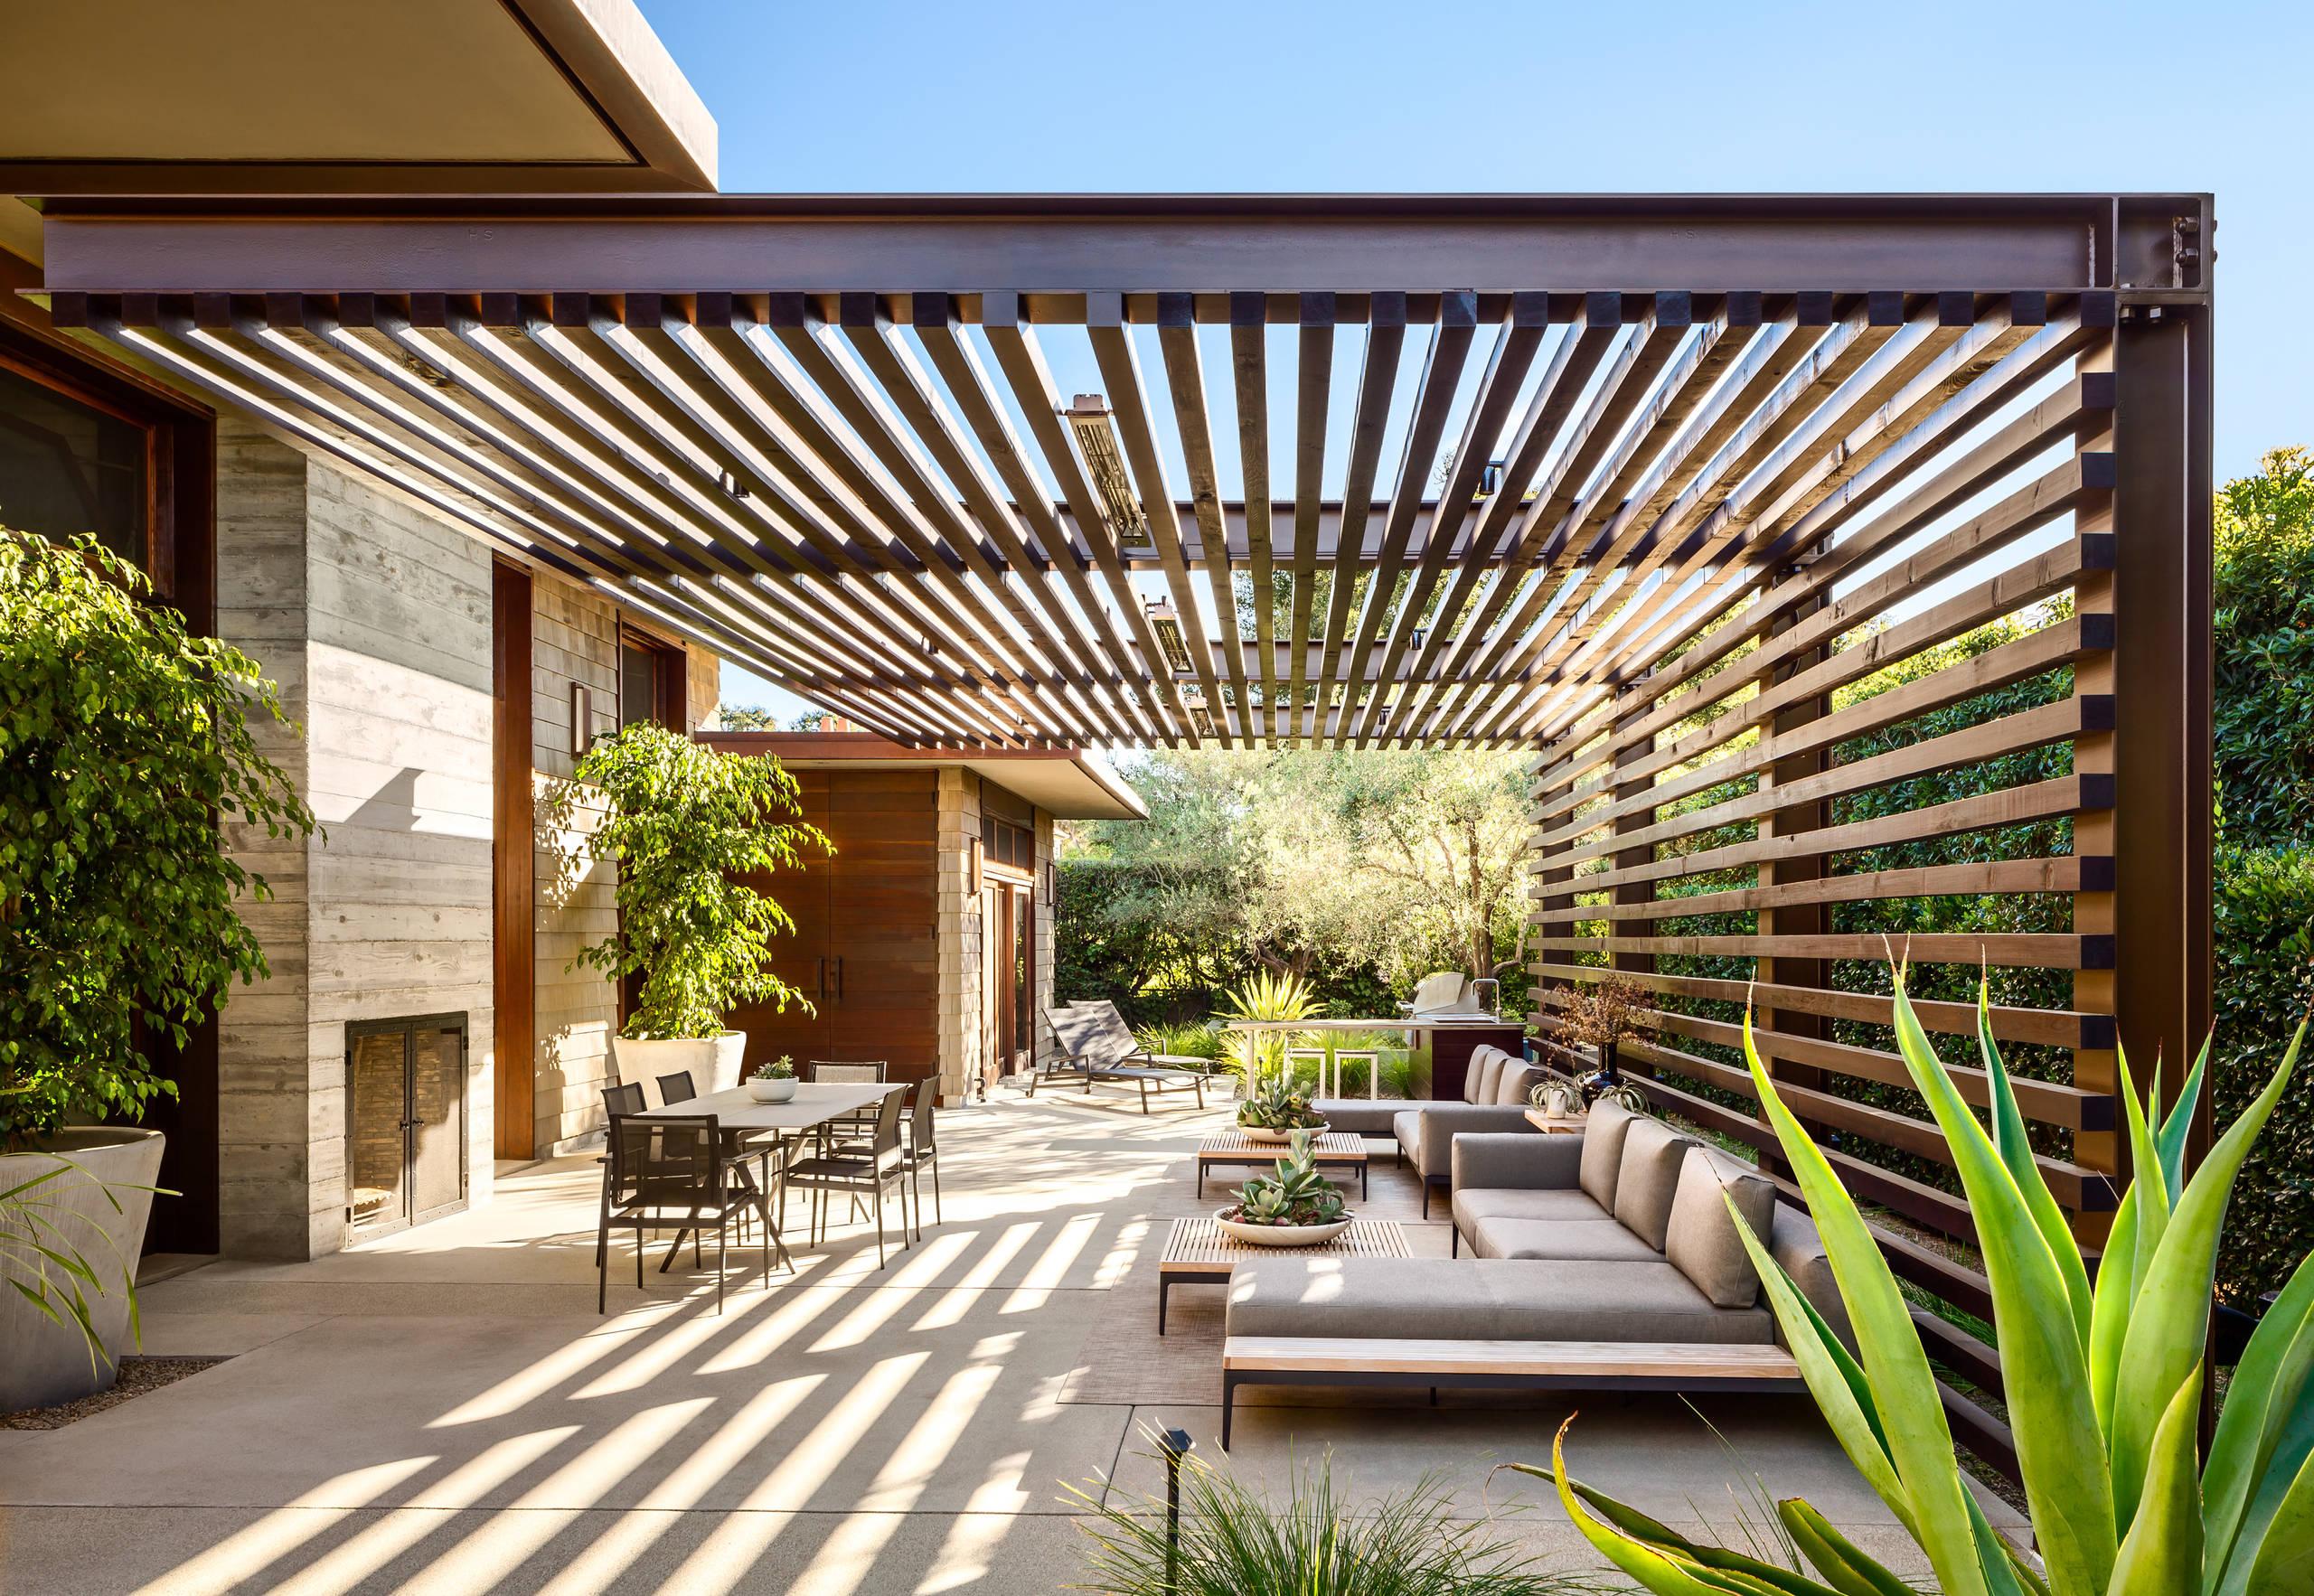 75 beautiful concrete patio pictures